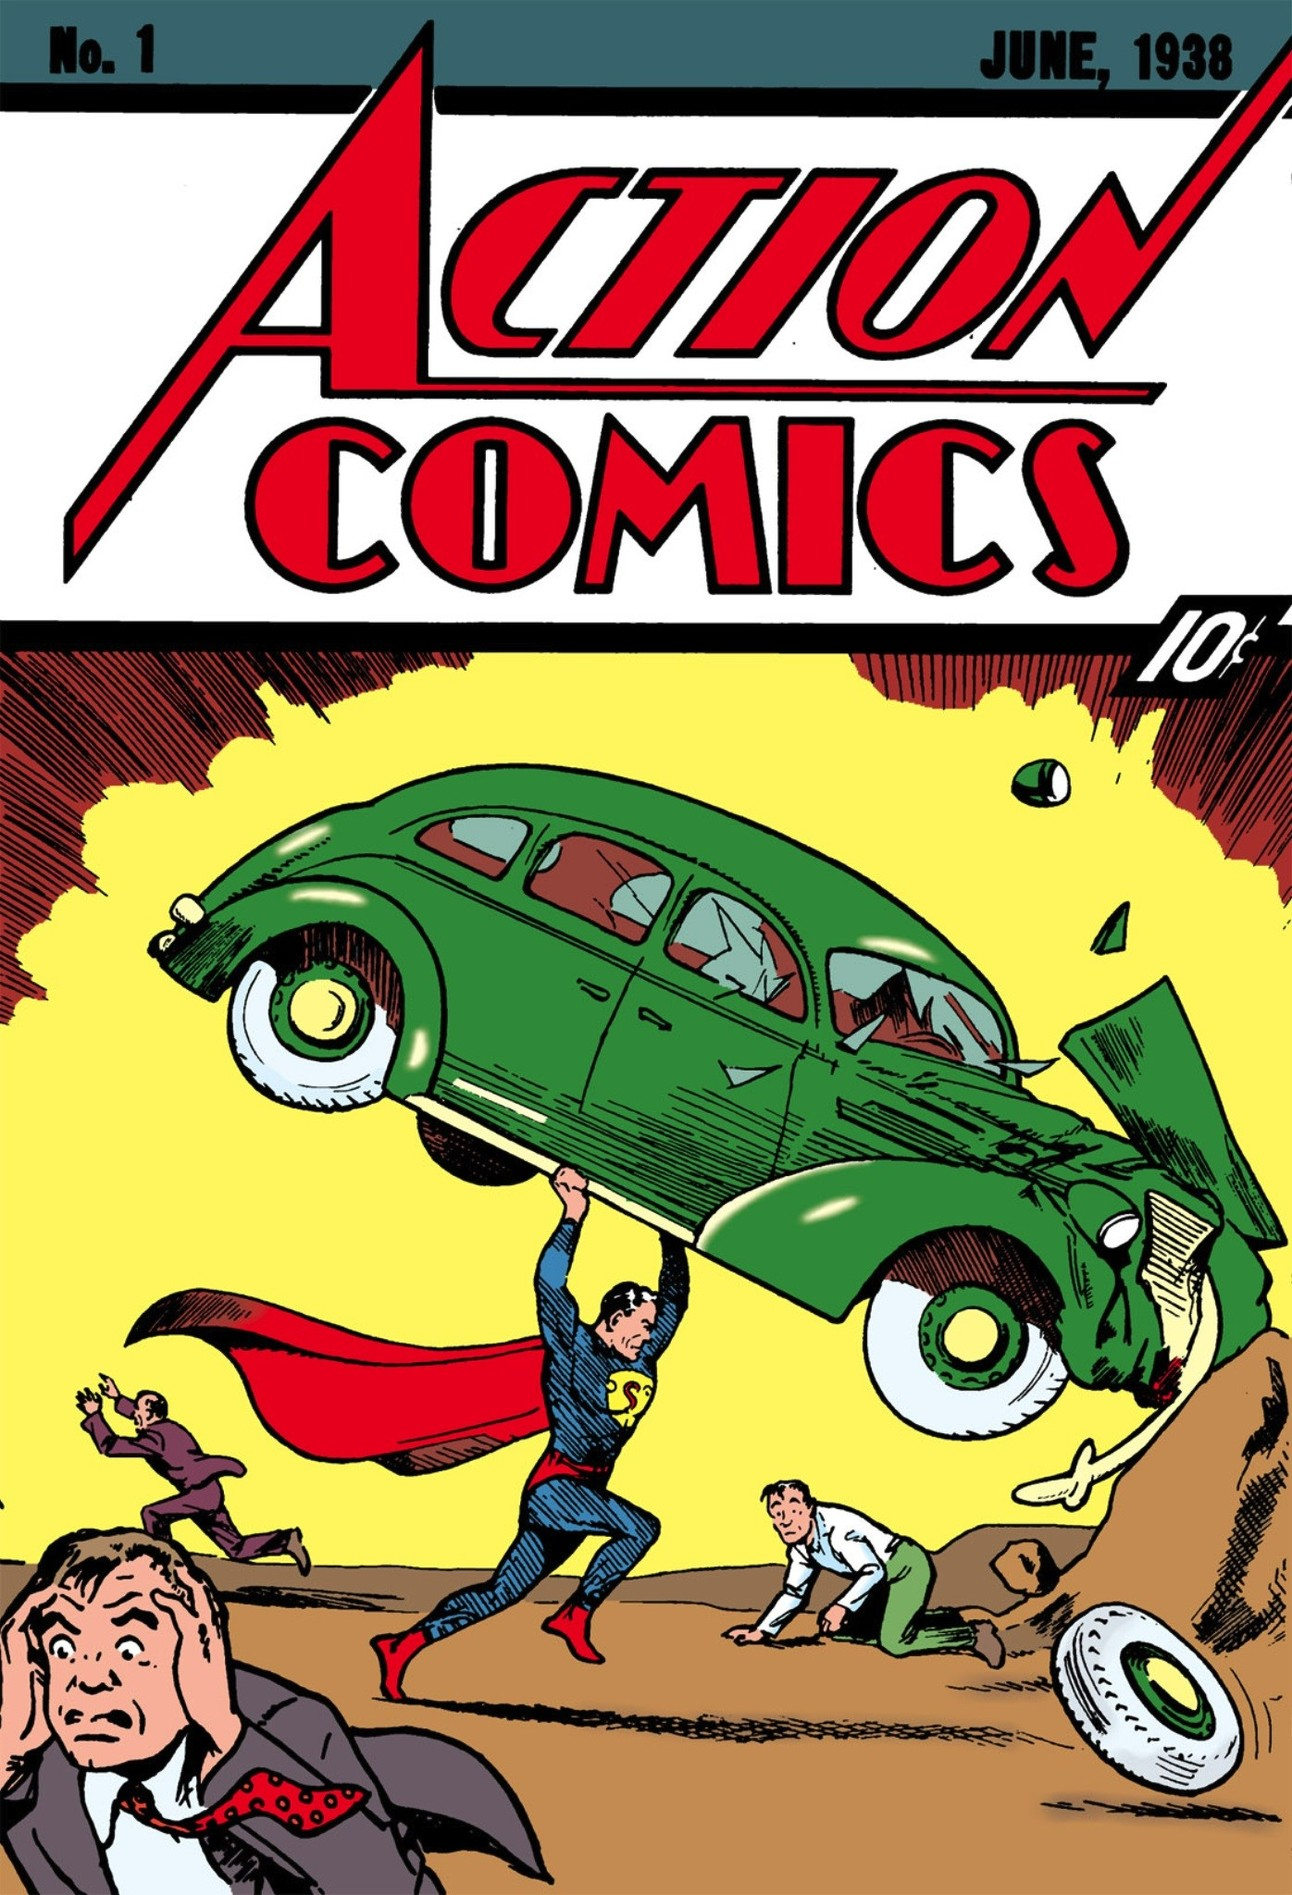 Action Comics 1 Superman